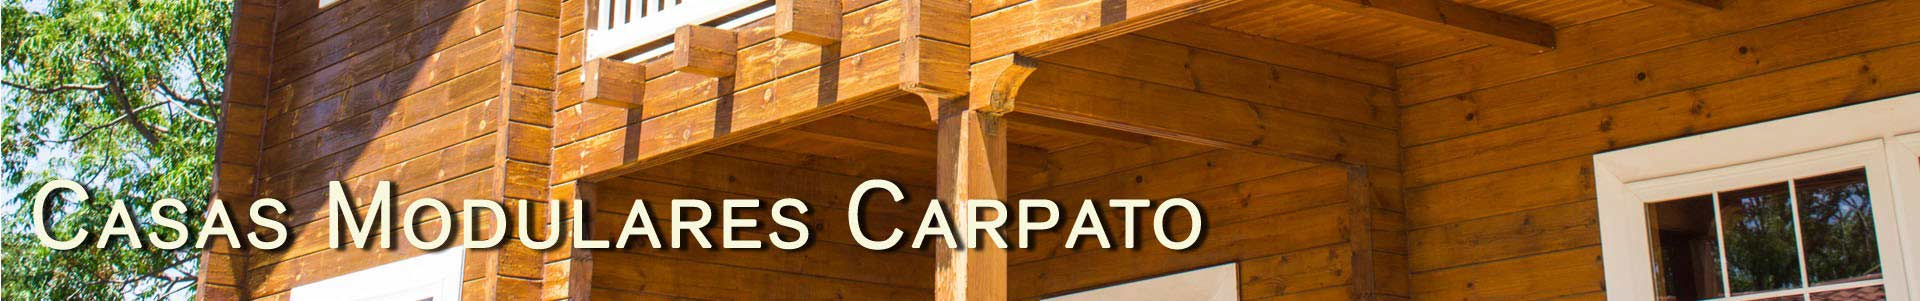 Casas de madera modulares Carpato